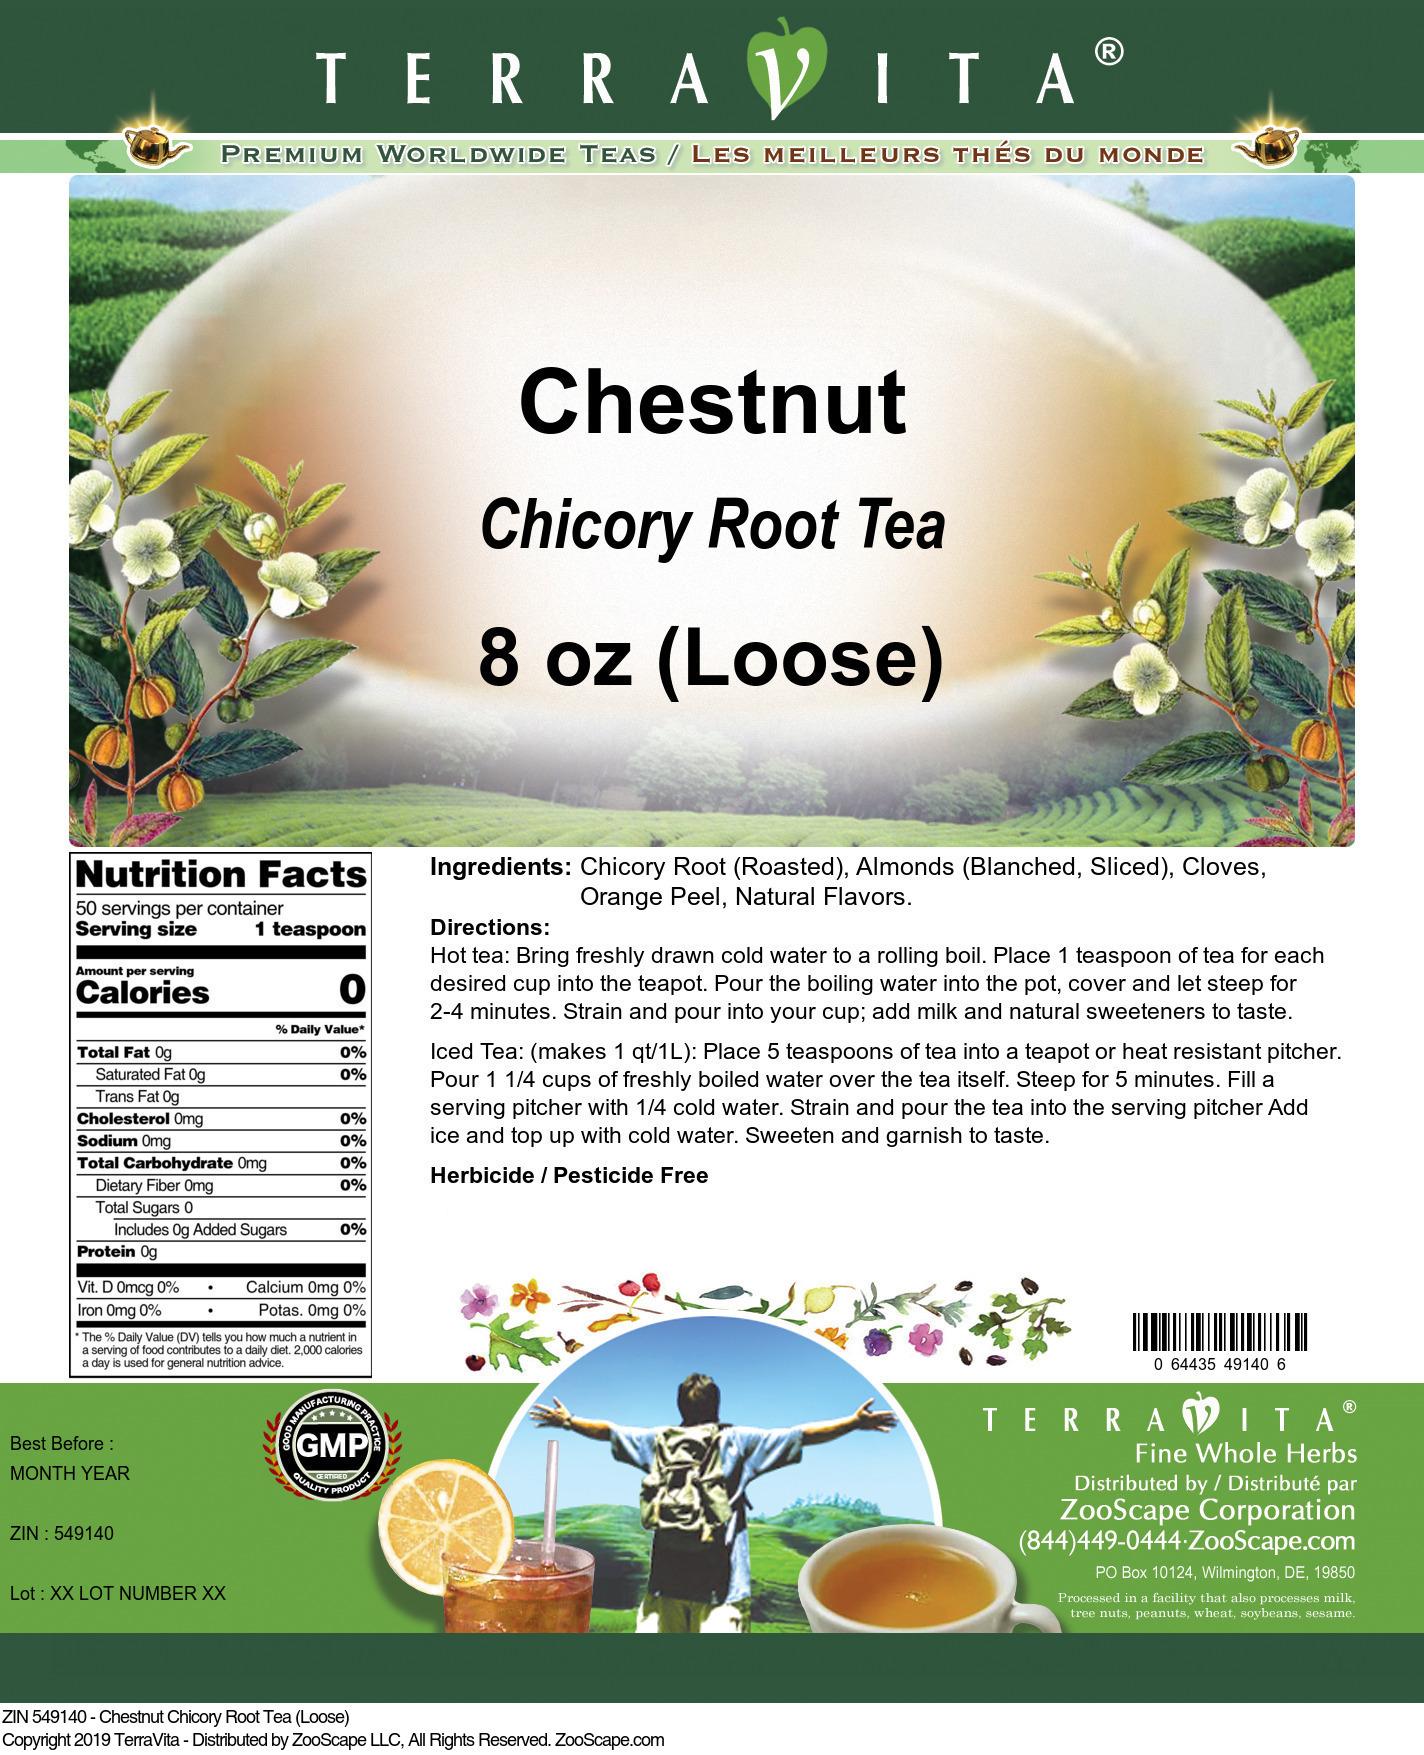 Chestnut Chicory Root